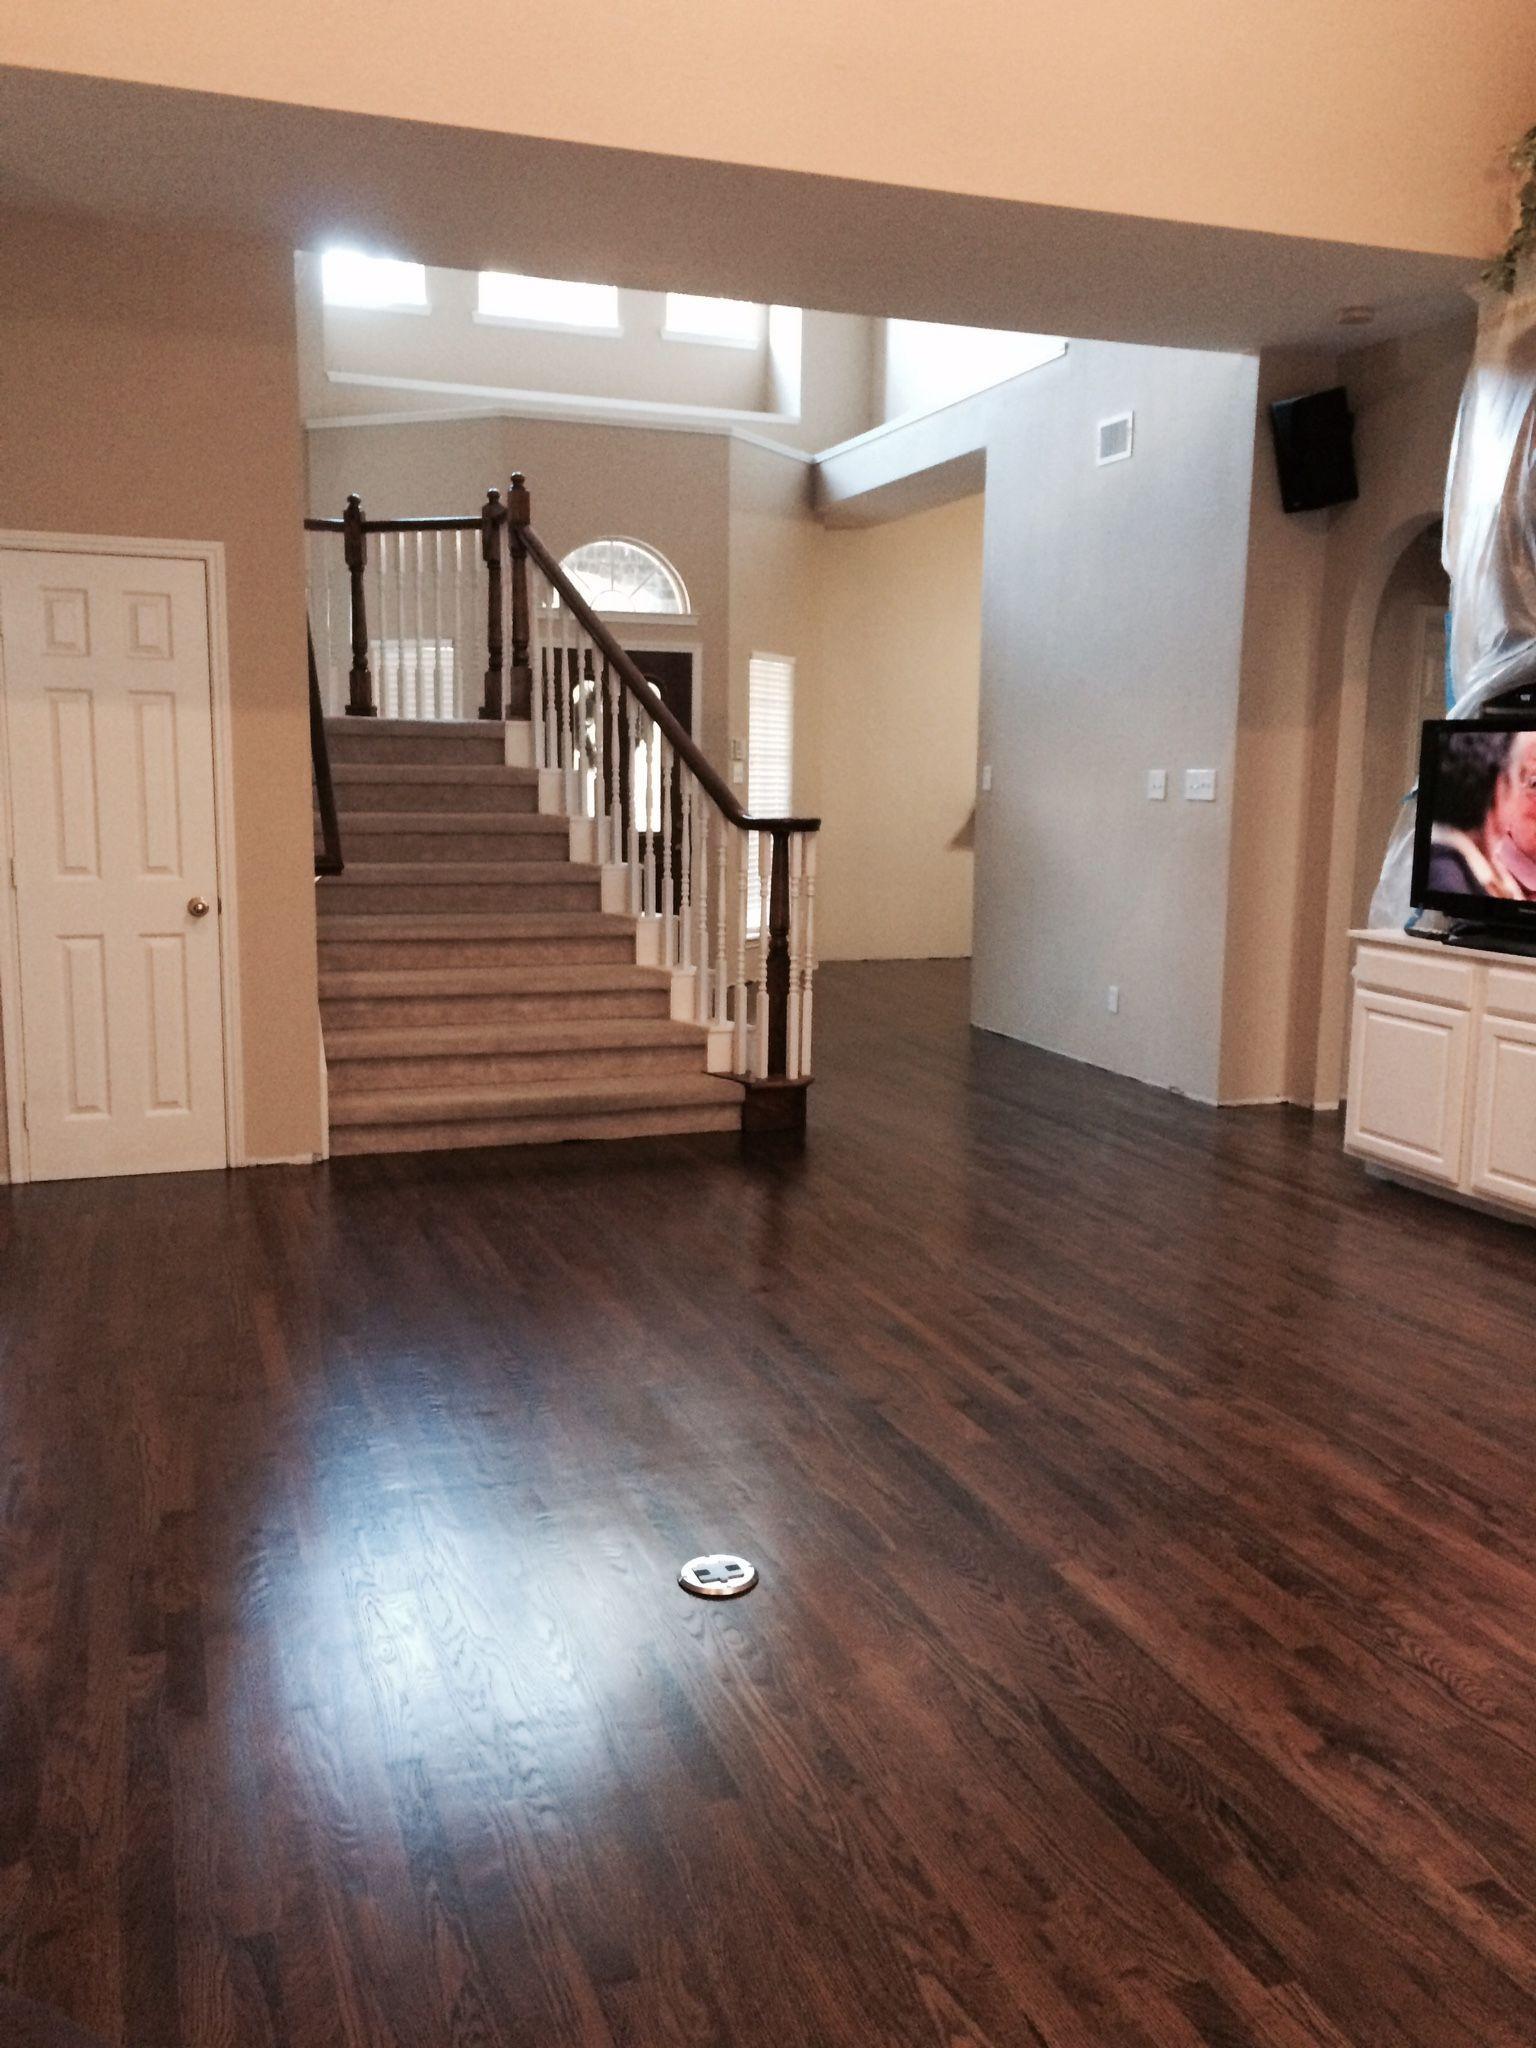 selecting hardwood floor color of dark walnut stain on white oak hardwood remodel 1floors in 2018 with dark walnut stain on white oak hardwood walnut hardwood flooring hardwood floor stain colors